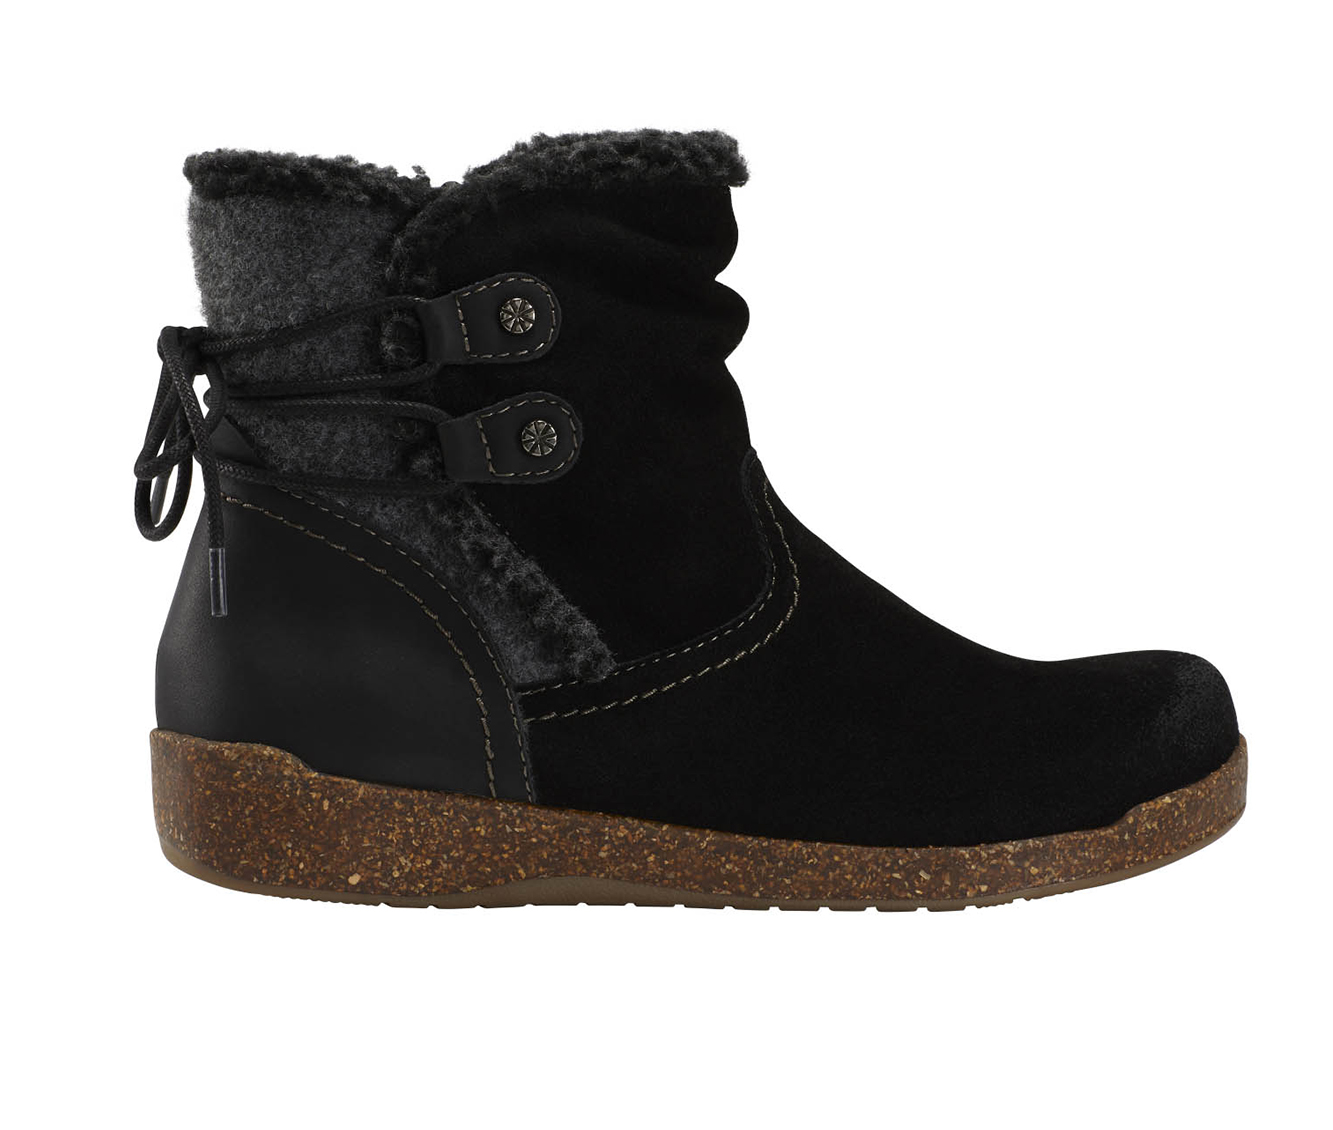 Earth Origins Aurora Jolene Women's Boots (Black - Suede)